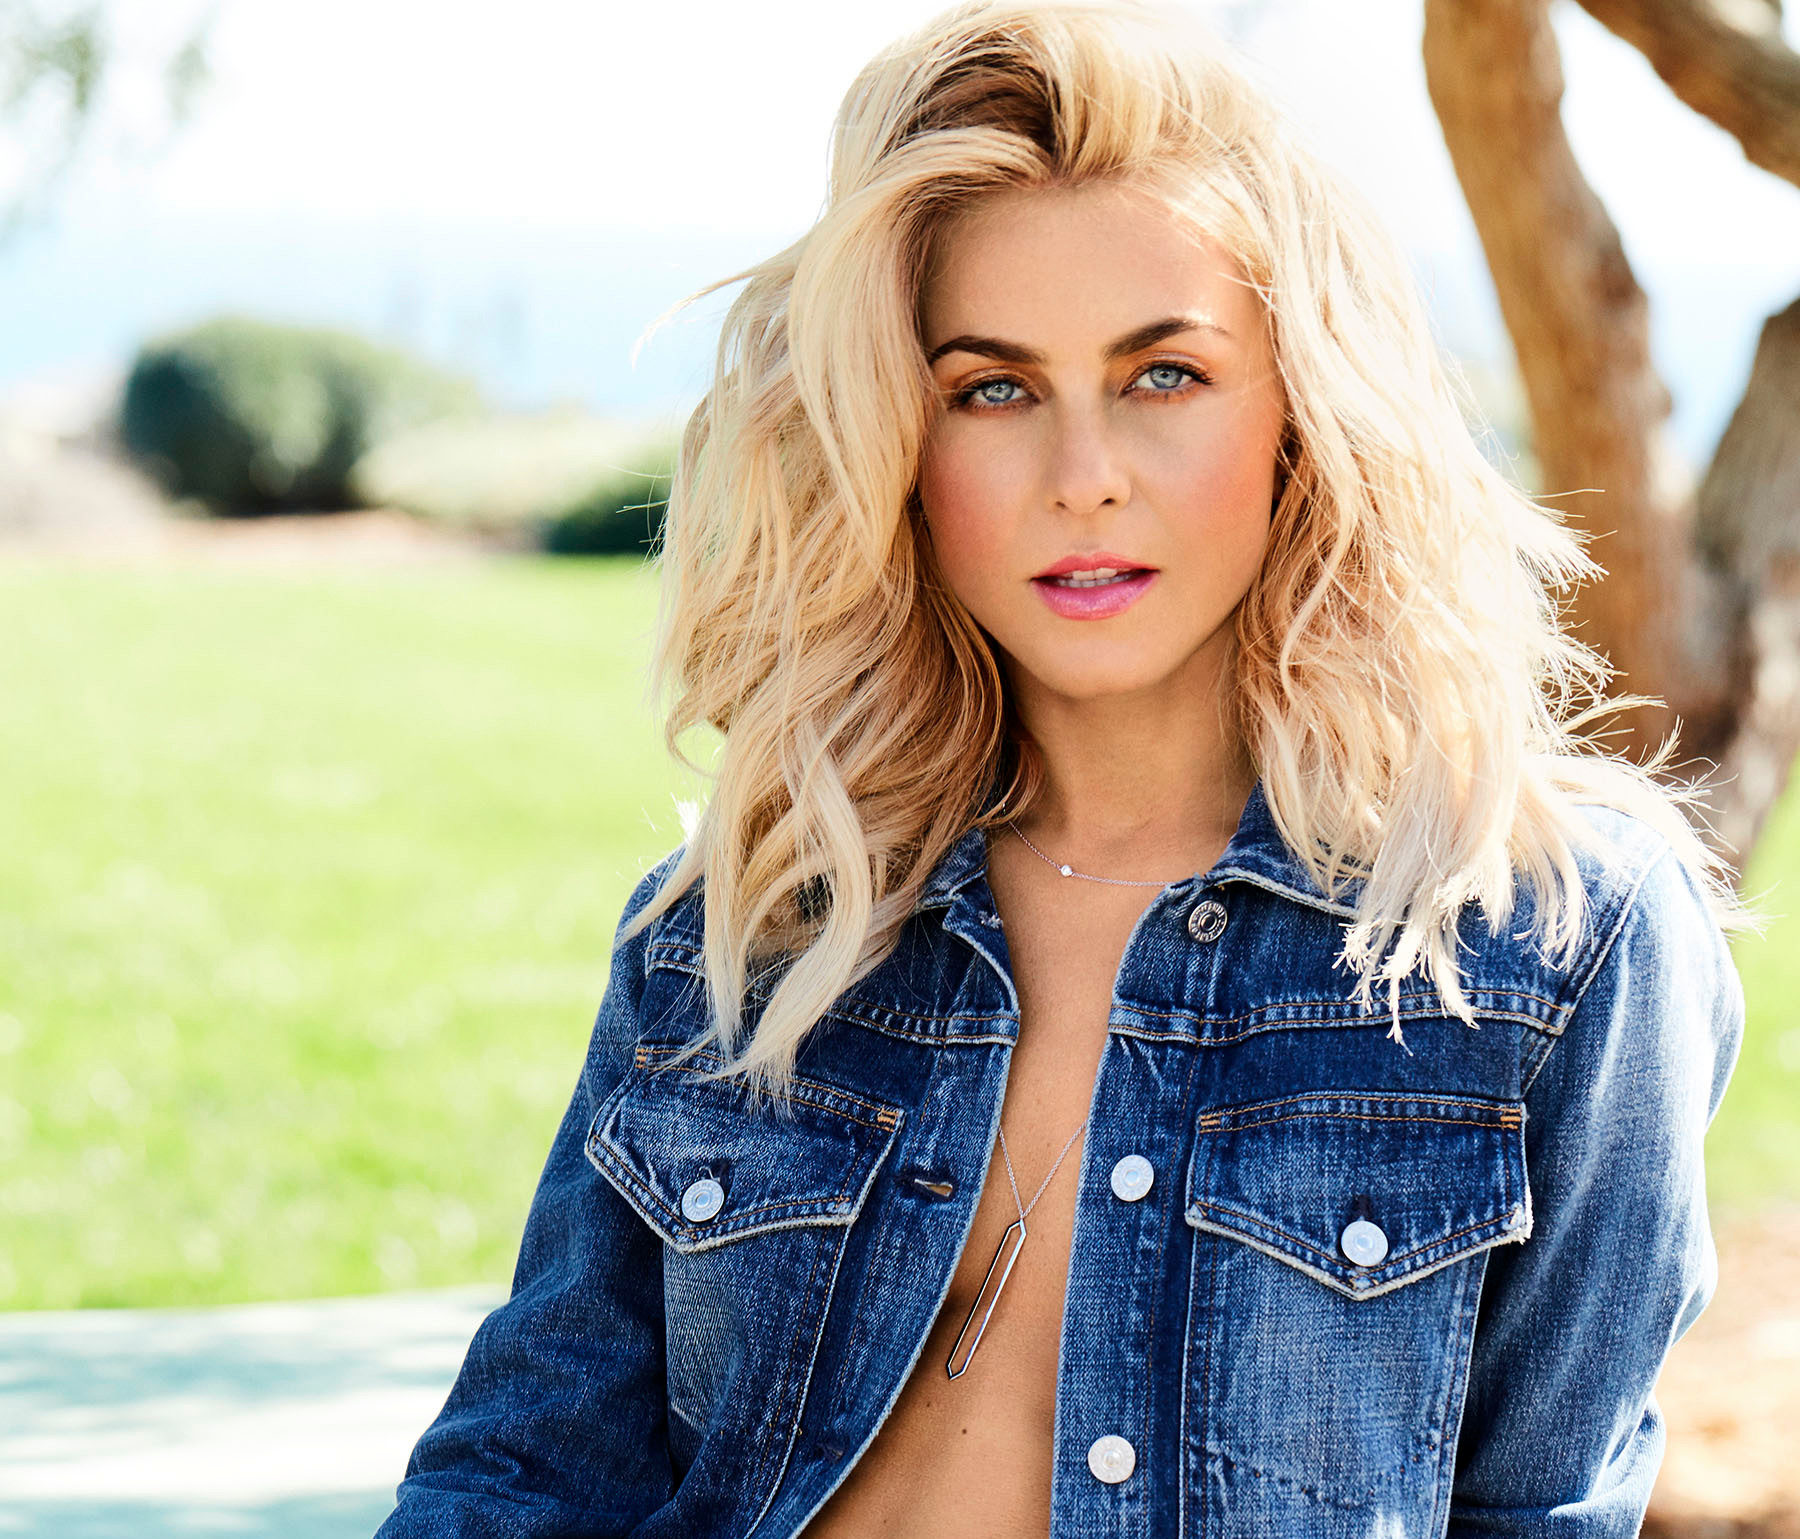 julianne hough hottest female reality tv stars